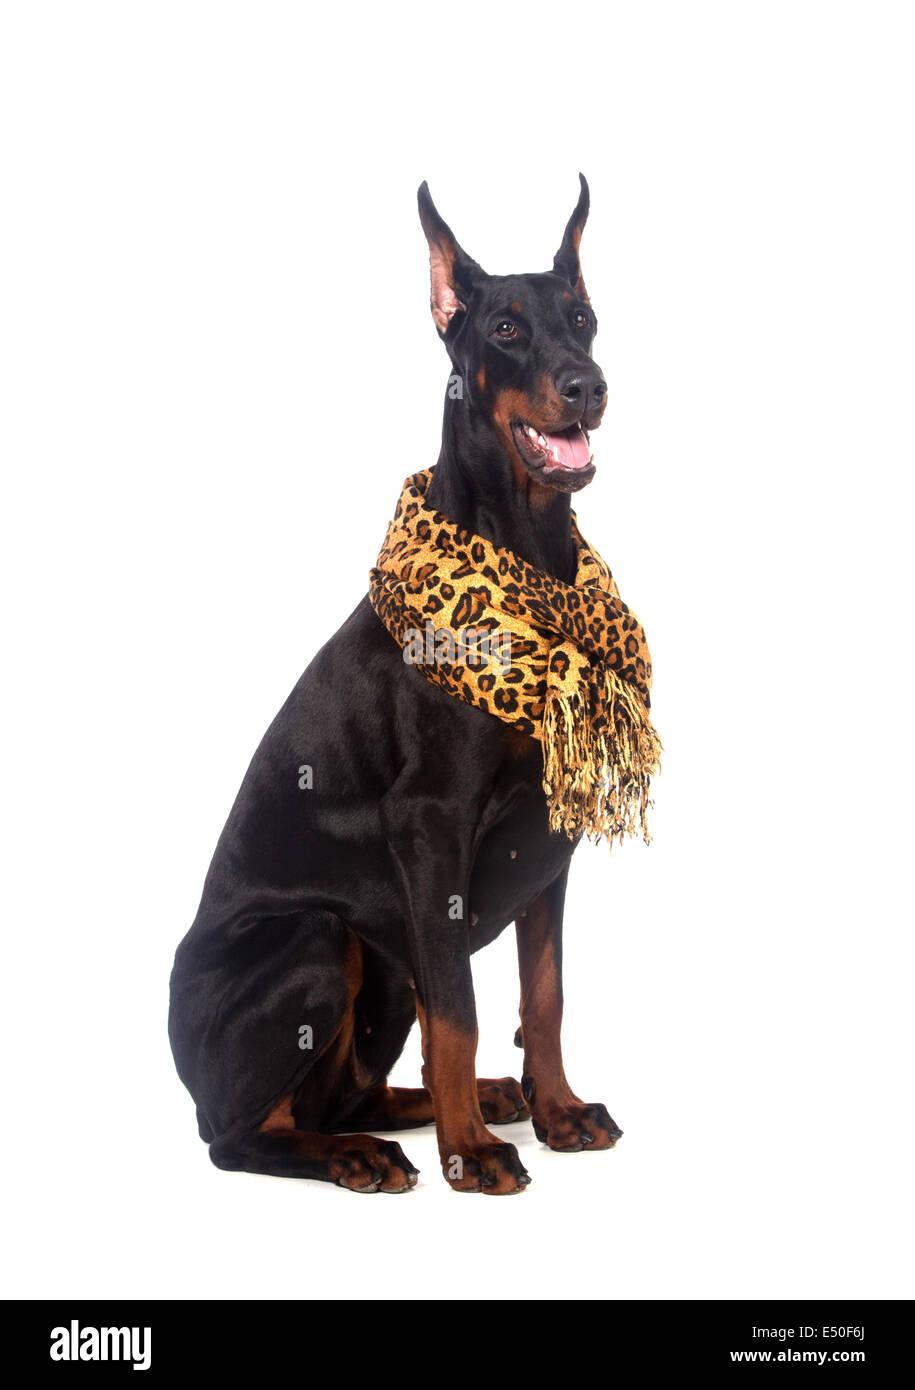 Doberman dog with scarf - Stock Image